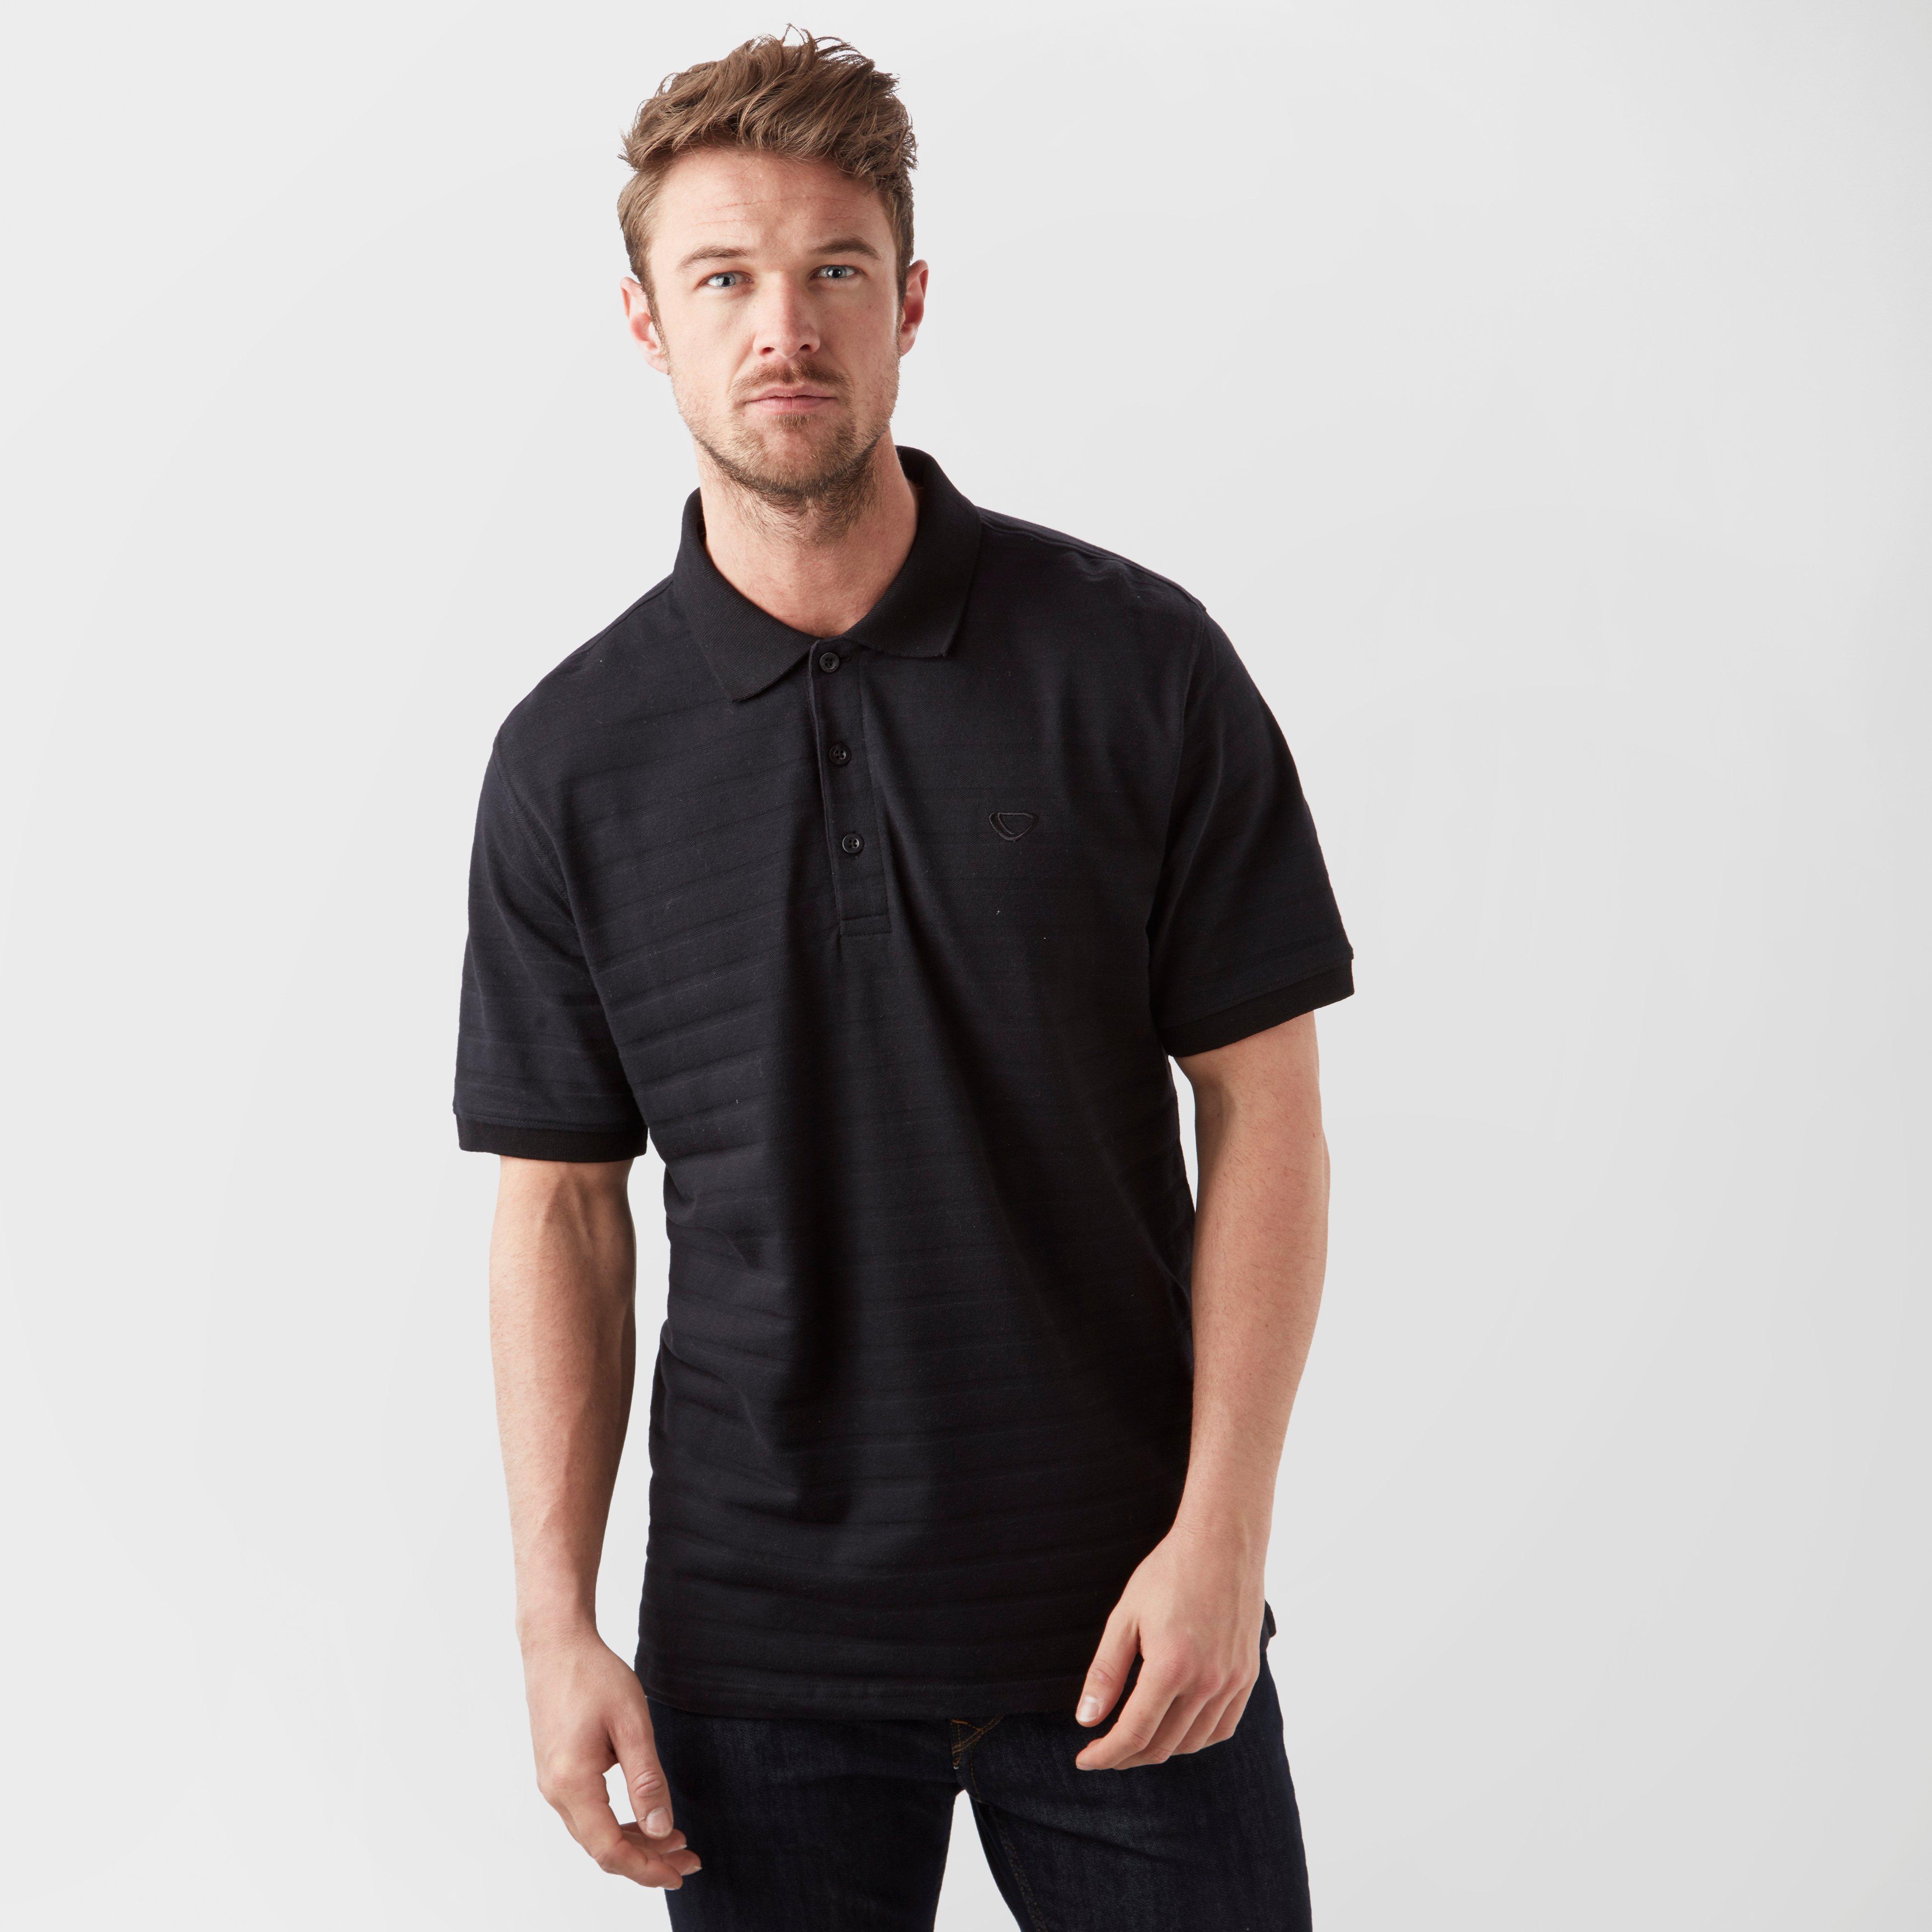 Brasher Brasher Mens Polo Shirt - Black, Black